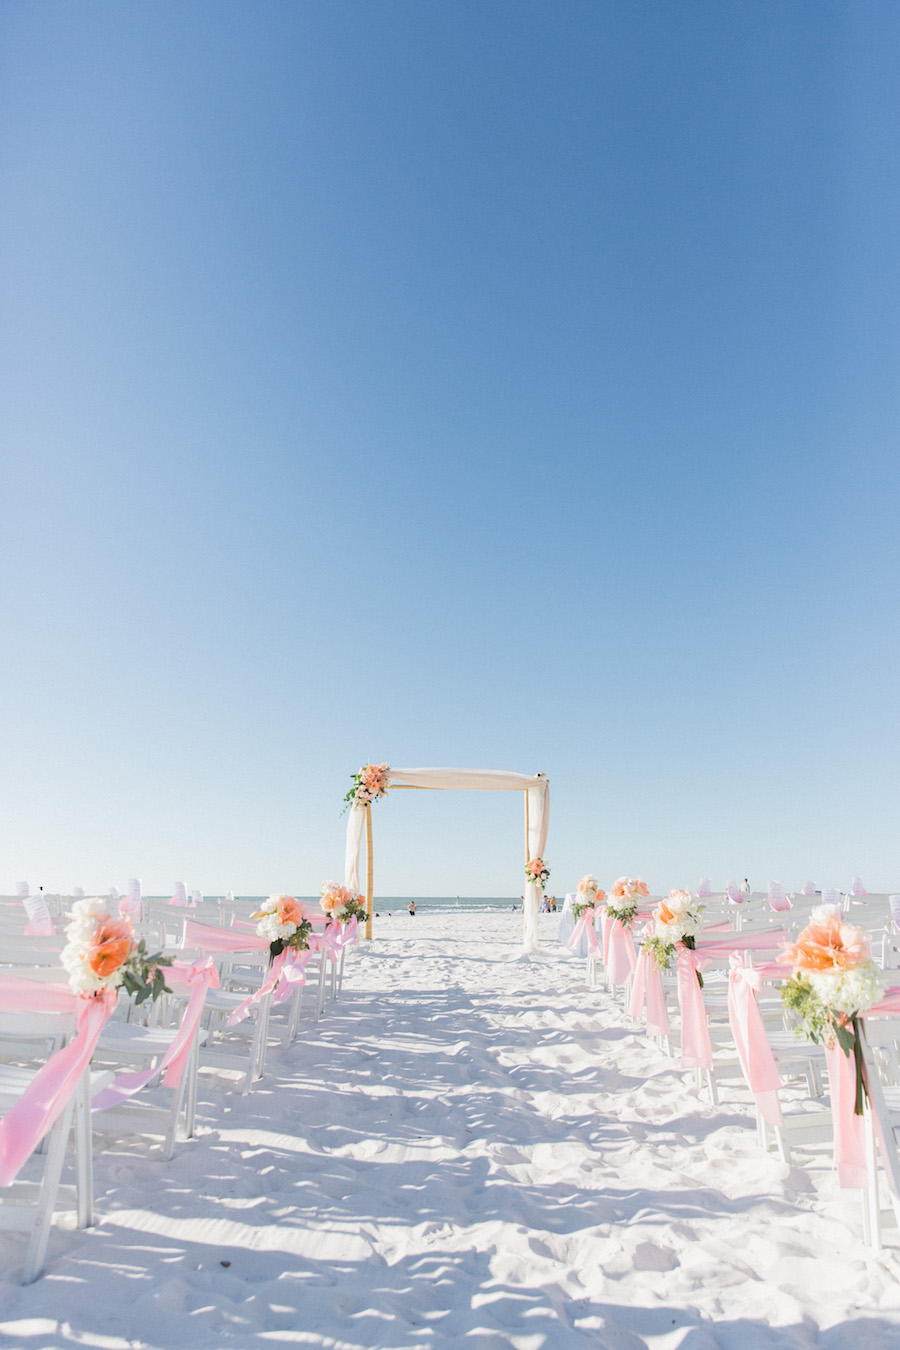 Florida Beach wedding ceremony decor | Blush, ivory and peach ceremony wedding flowers | Tampa Bay Beachfront Hotel Wedding Venue Hilton Clearwater Beach